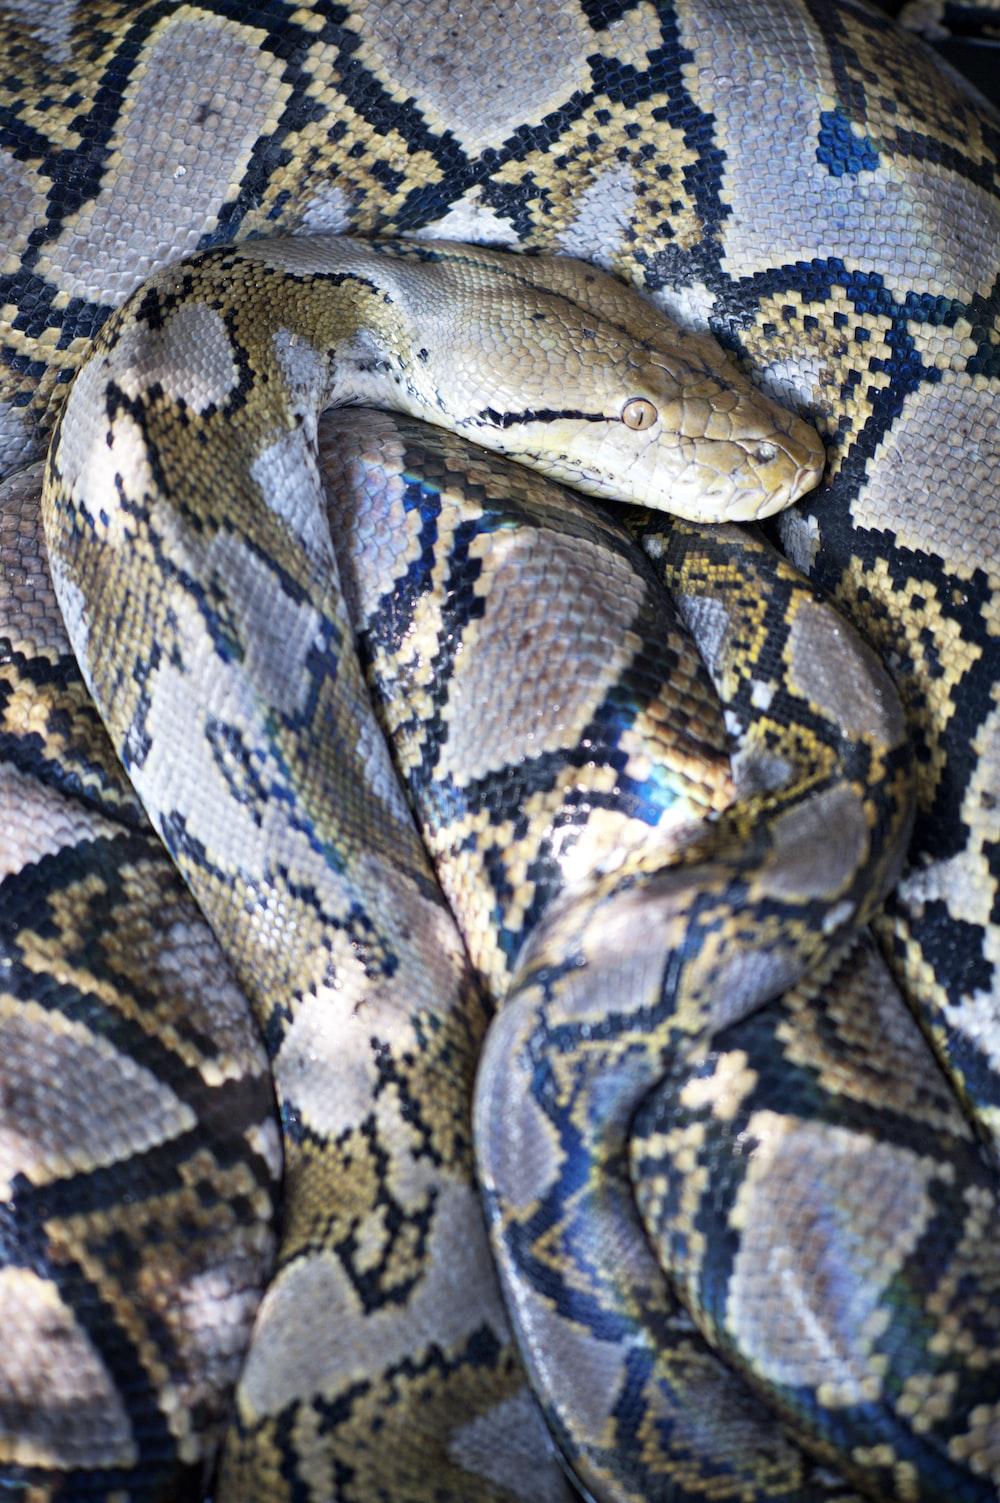 brown and black snake skin